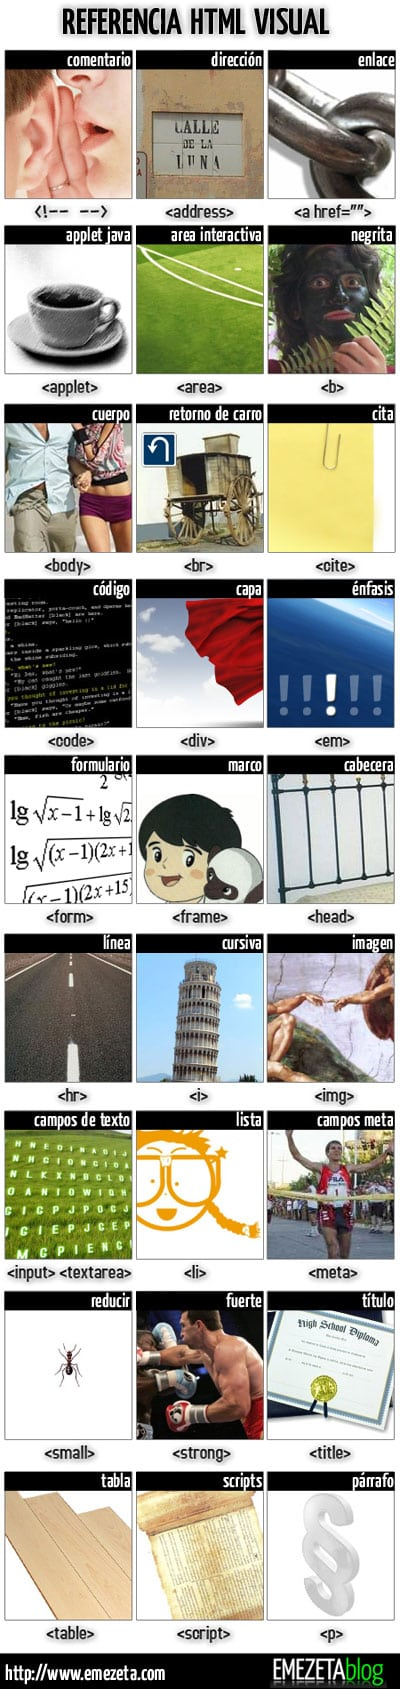 referencia html visual